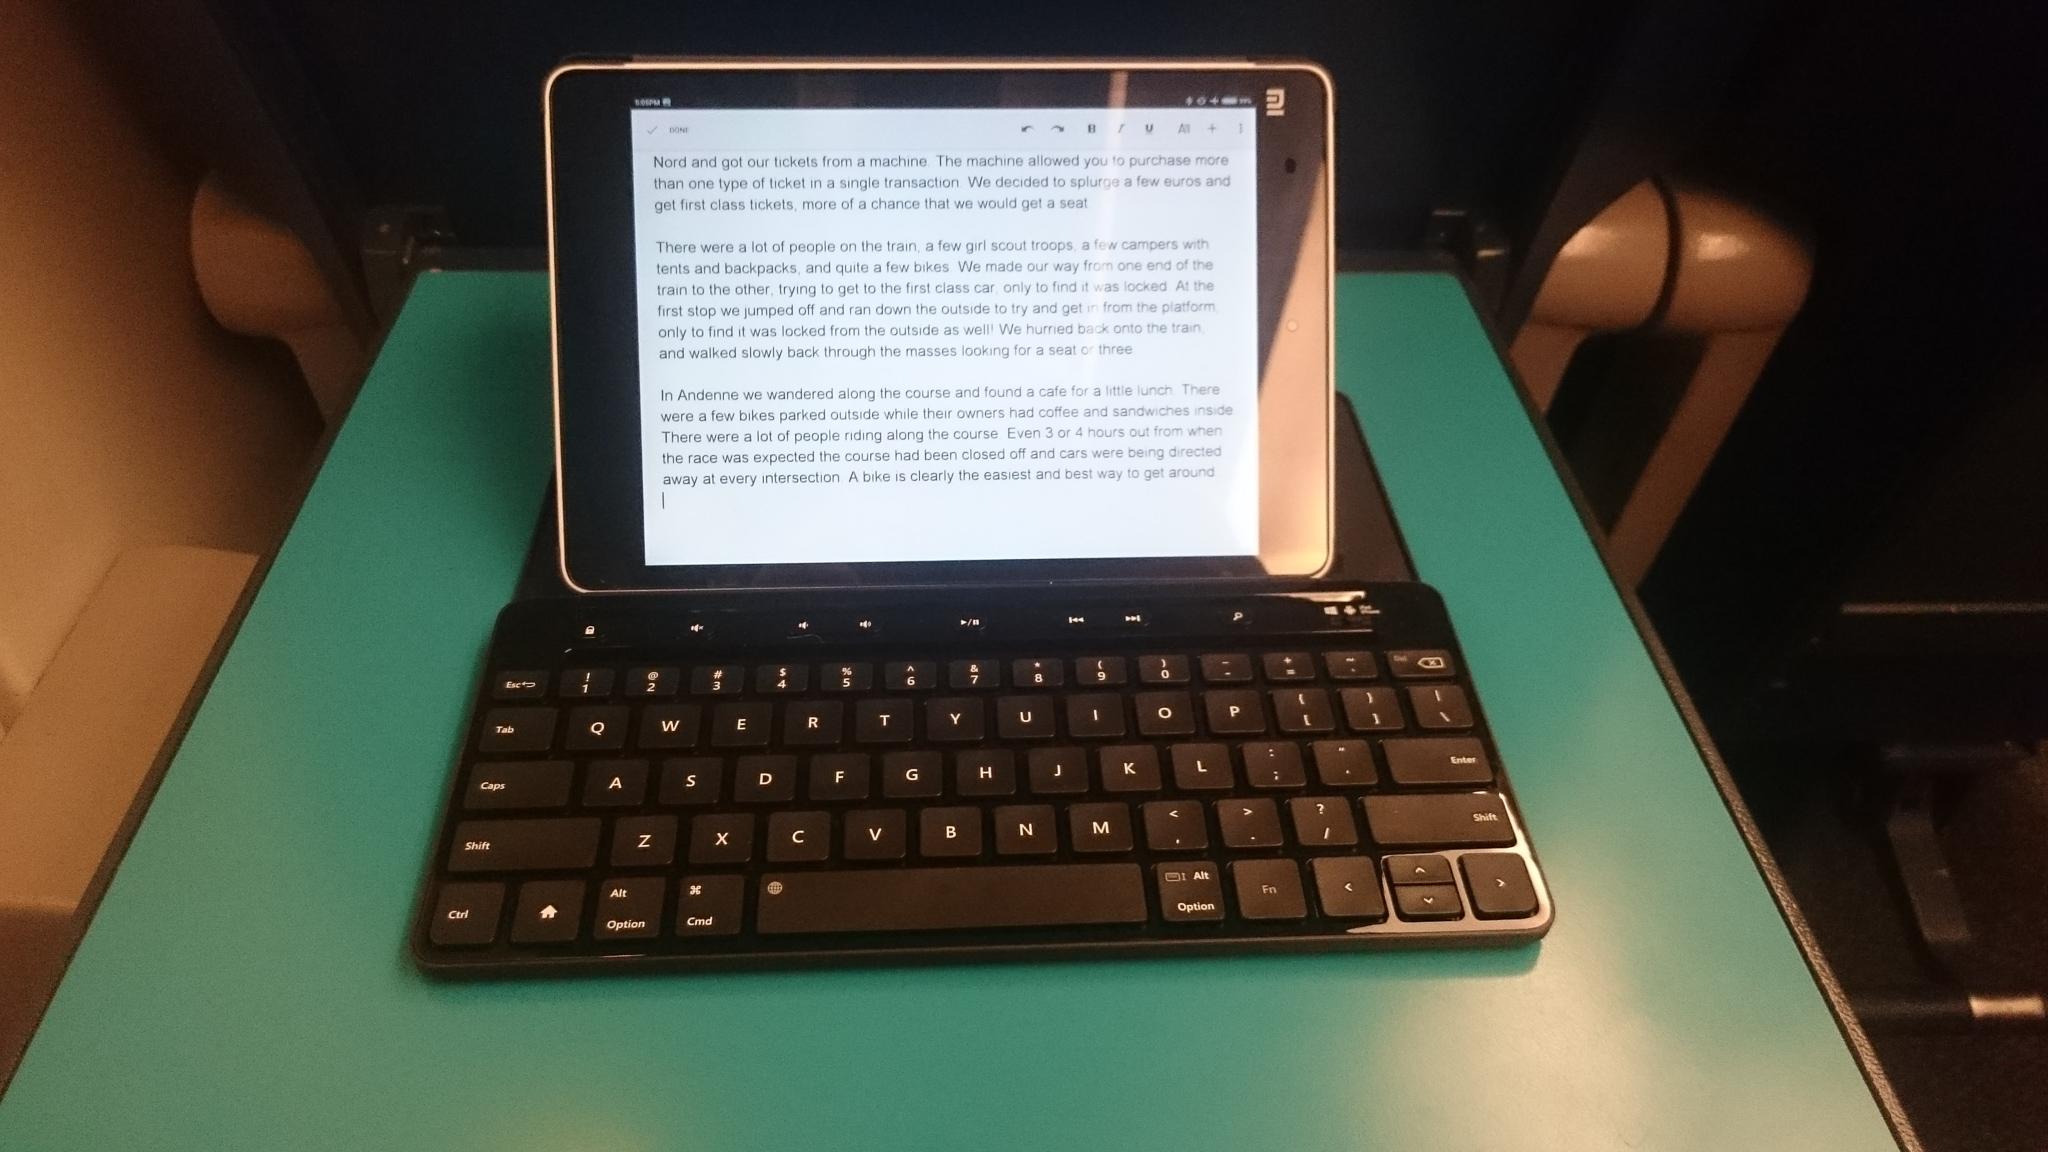 Xiaomi Mi Pad and the Microsoft Universal Keyboard